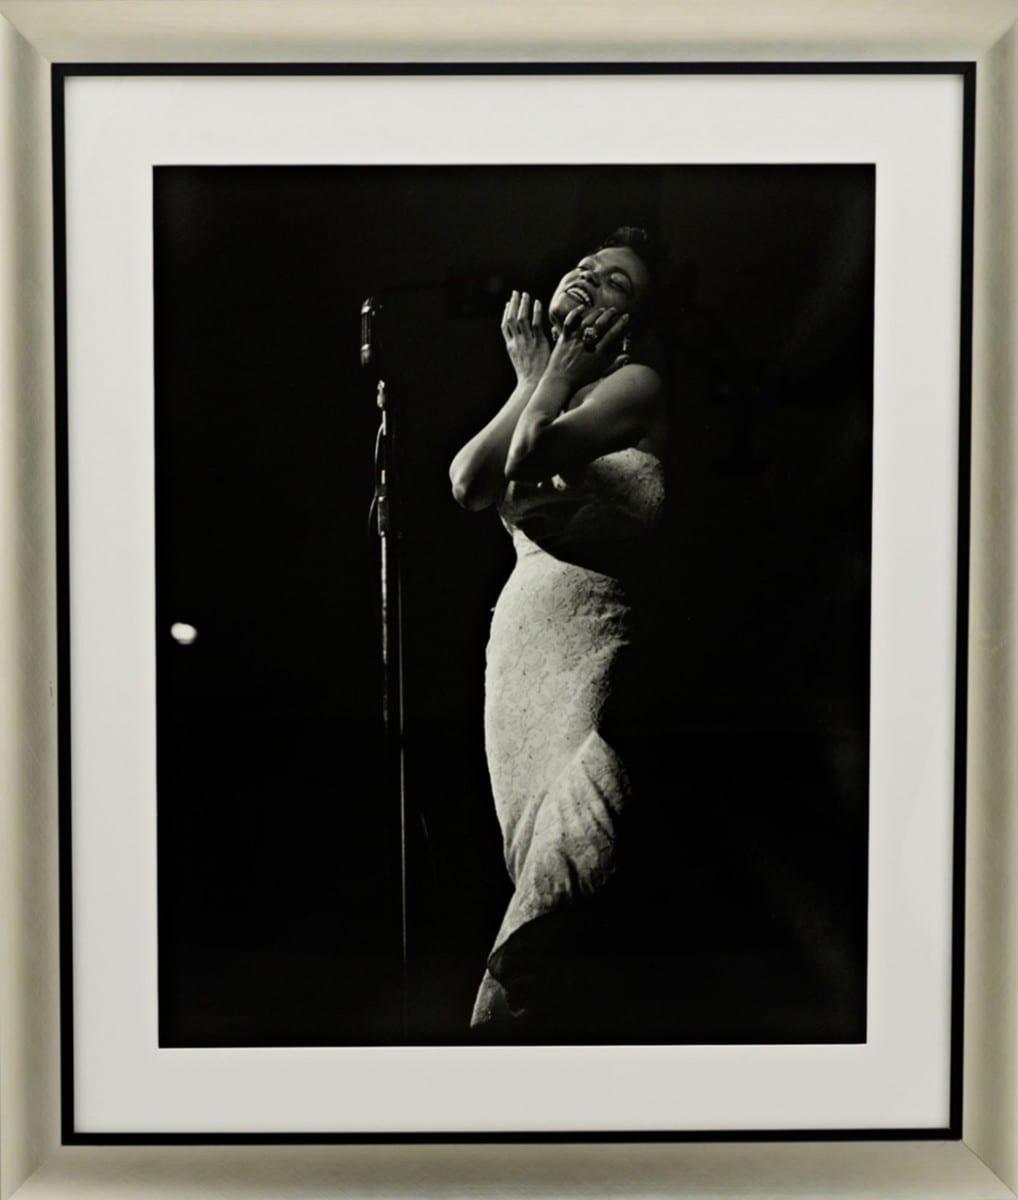 Michael Ochs, Eartha Kitt, gelatin silver print on archival fiber paper, 1970 ©Ralph Lauren Home and Getty Images